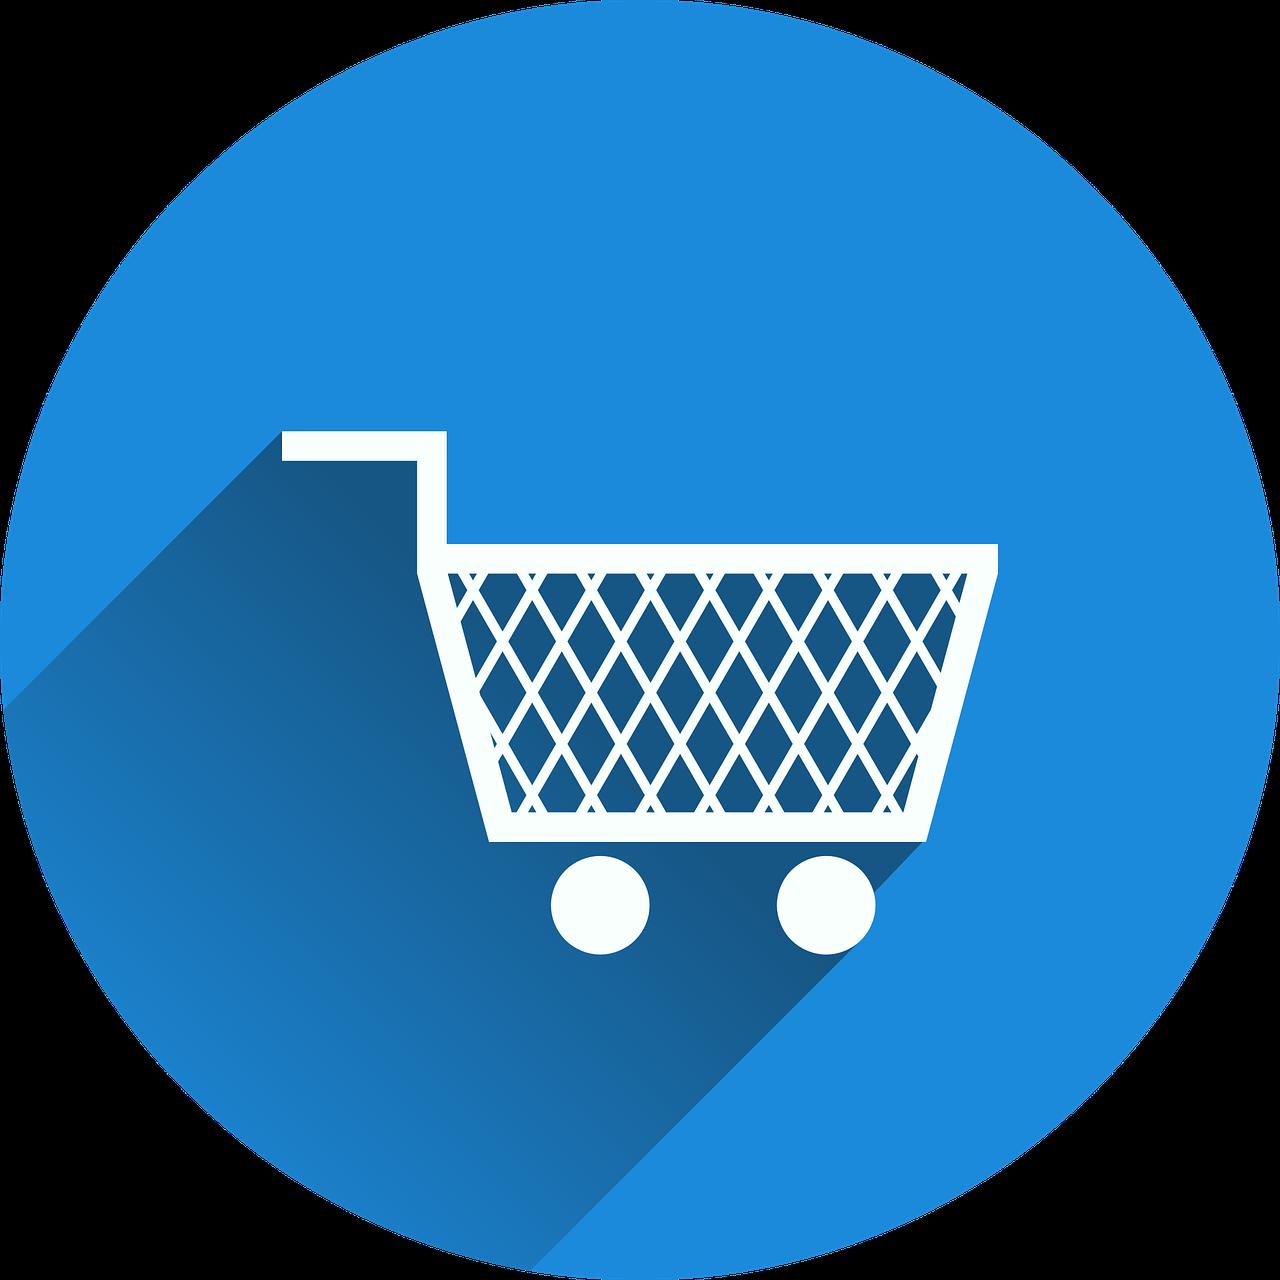 434 430 shopping cart 1105049 1280